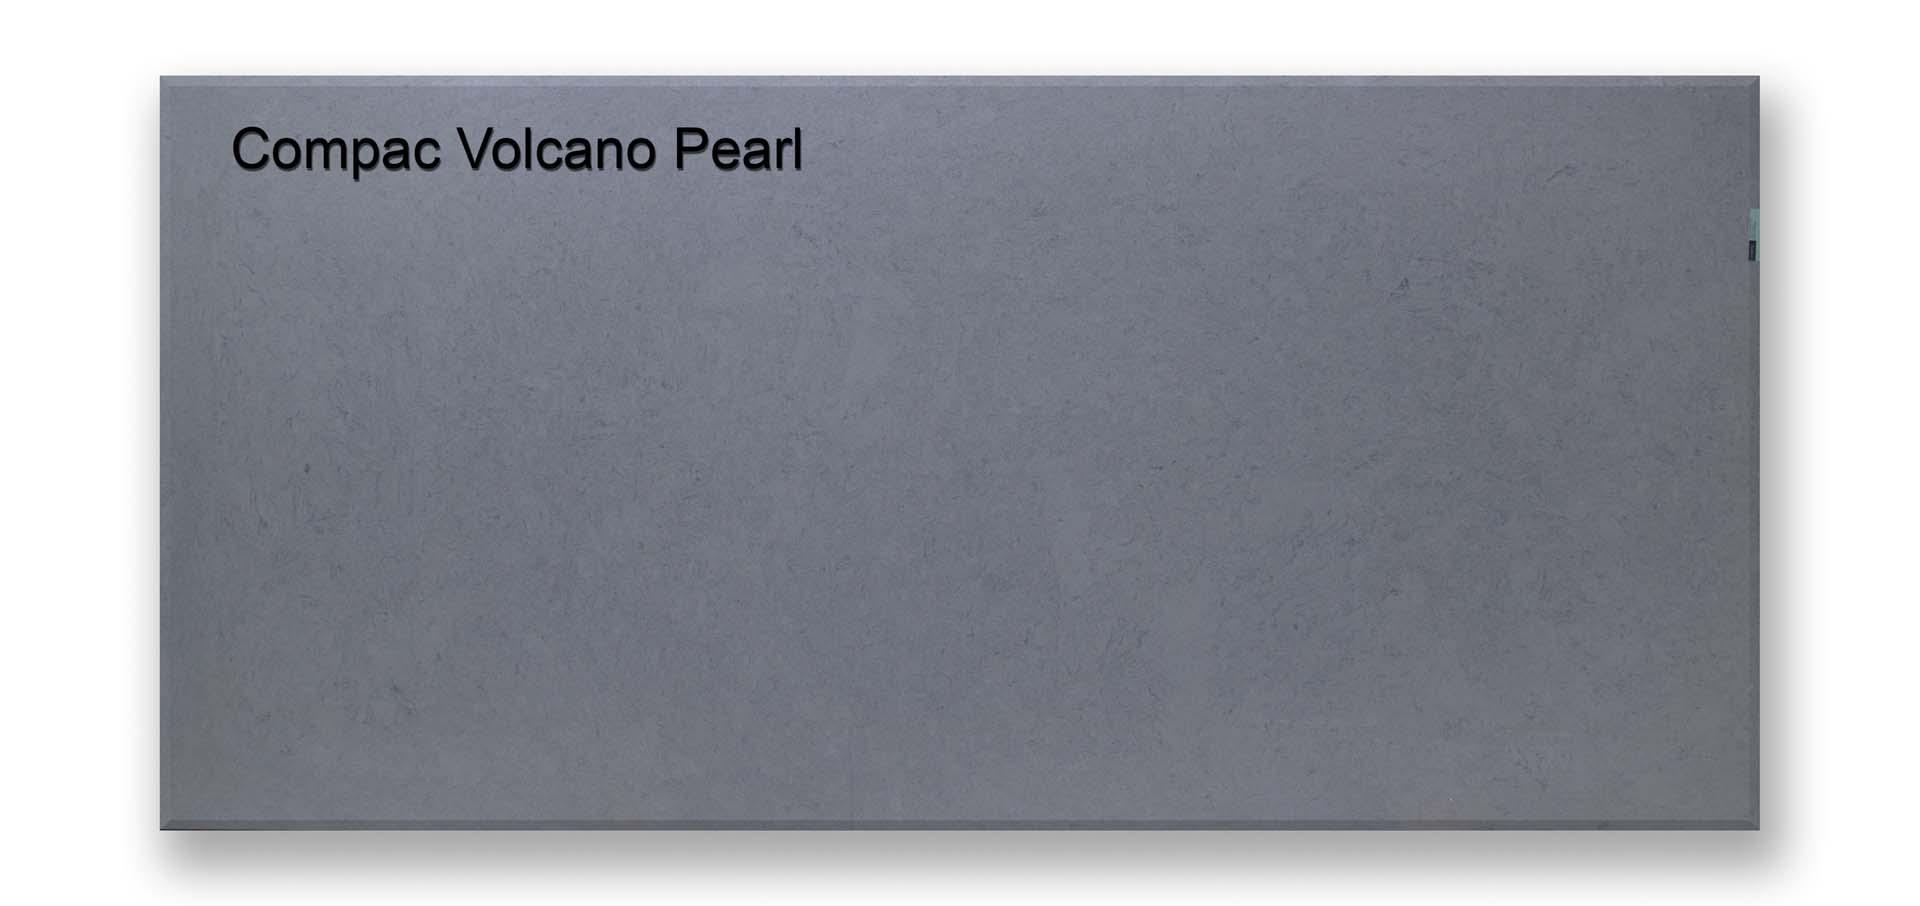 Obsidiana Compac Volcano Pearl CO201111 39125 171128-2a